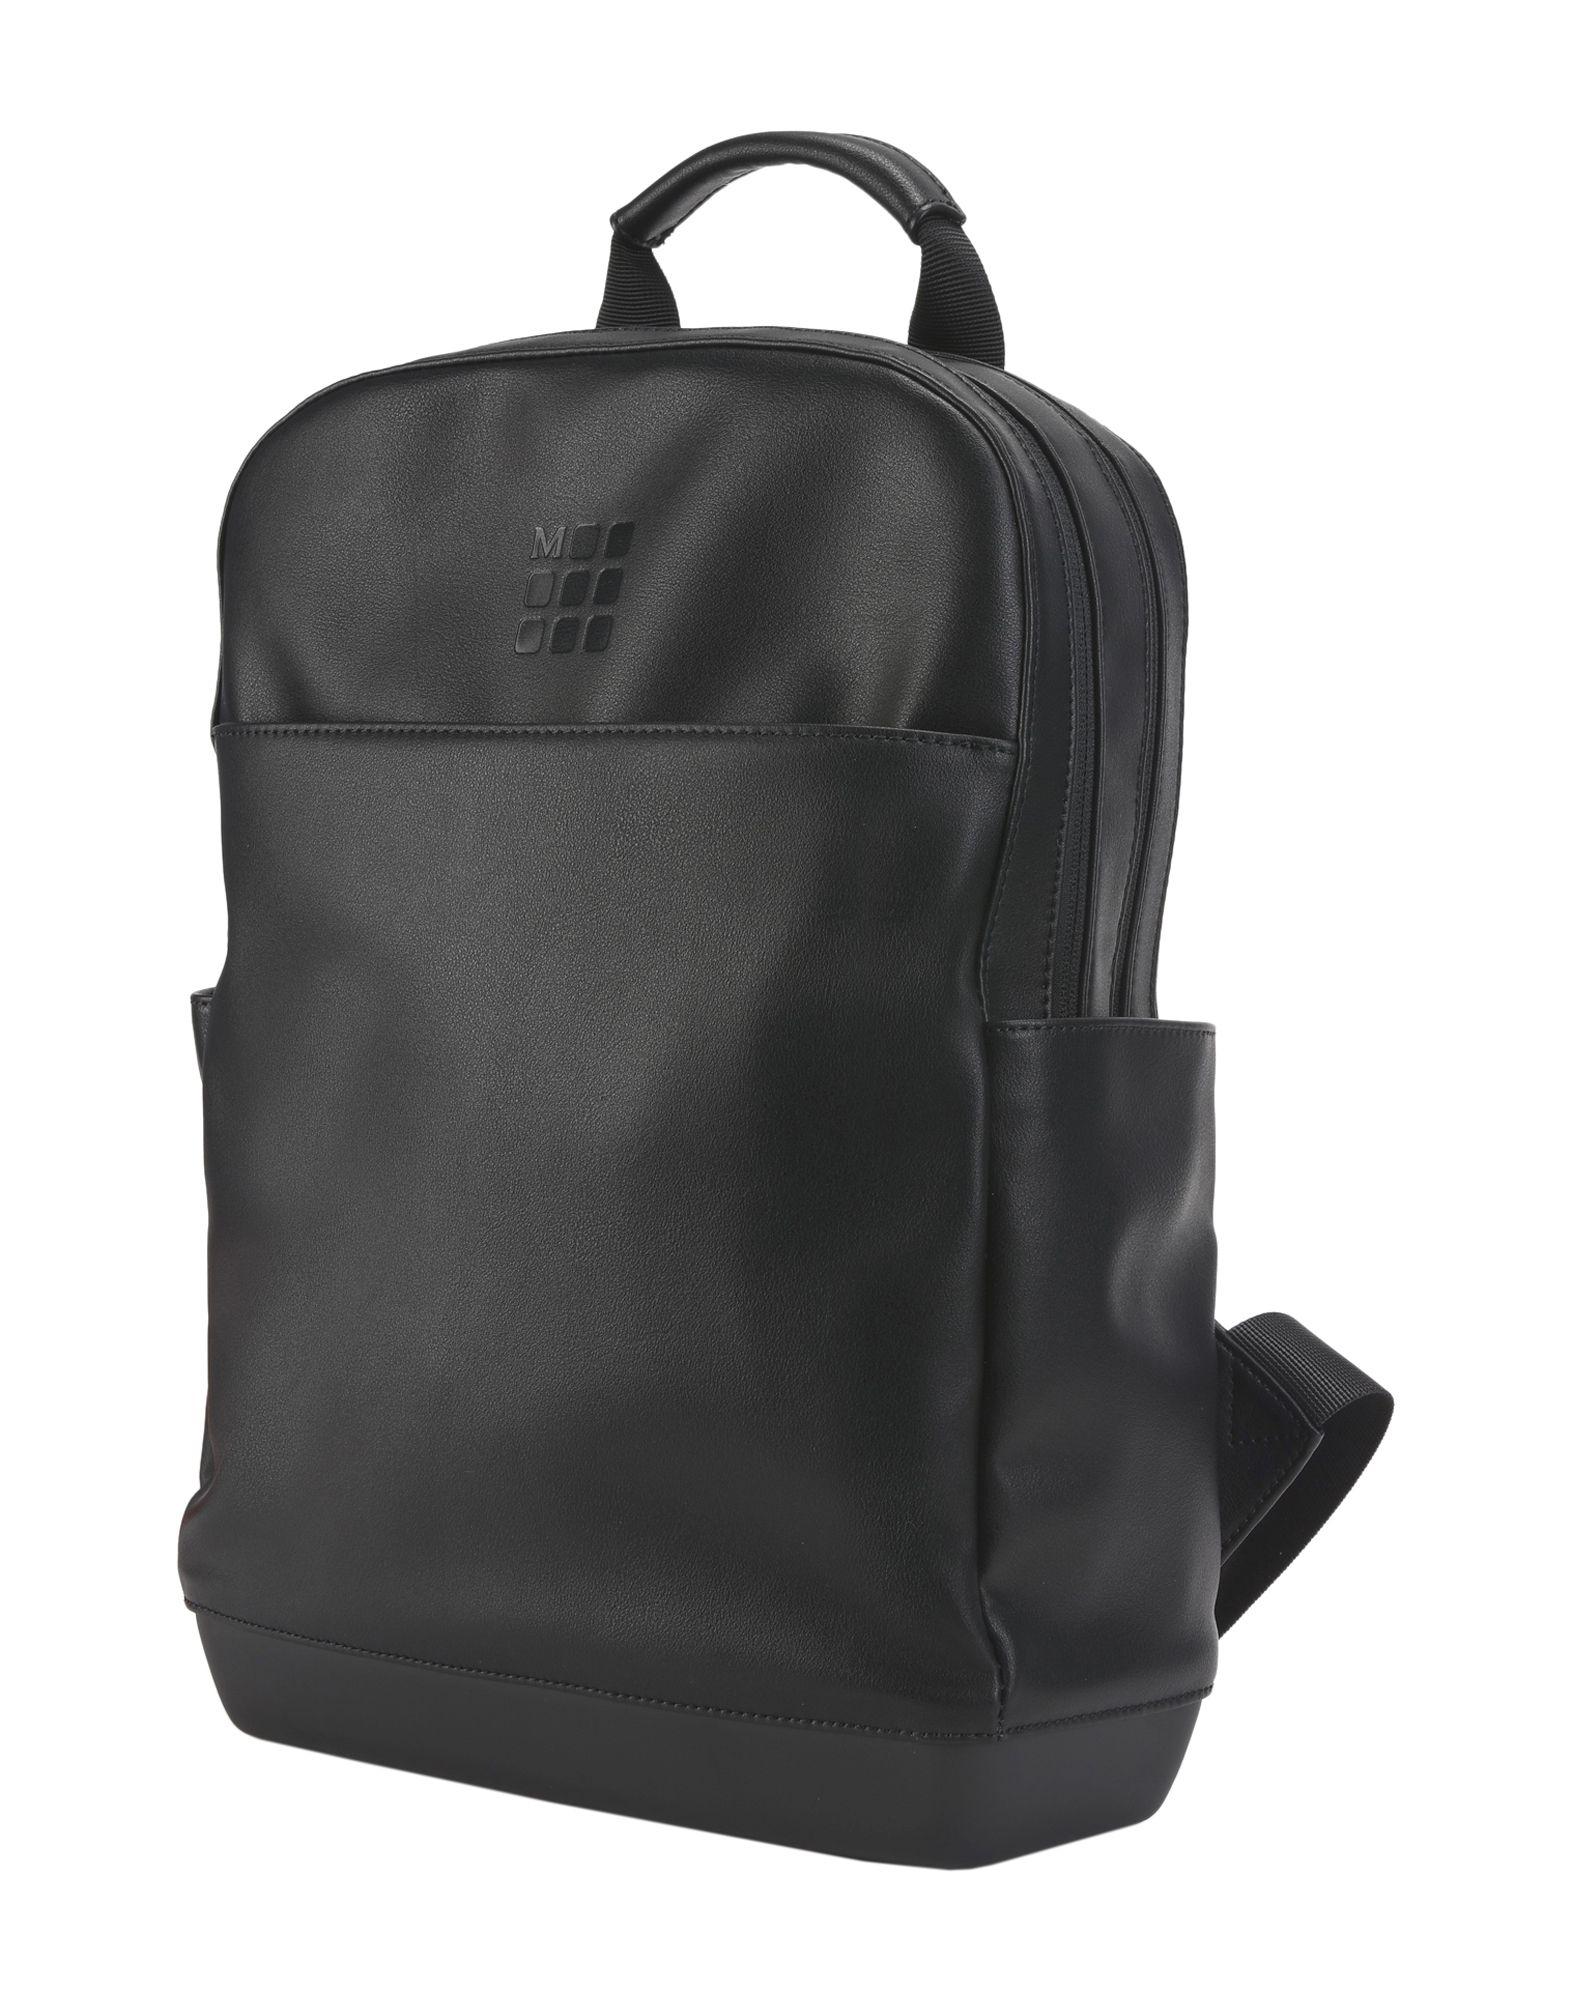 Zaini & Marsupi Moleskine Classic Pro Backpack - Donna - Acquista online su